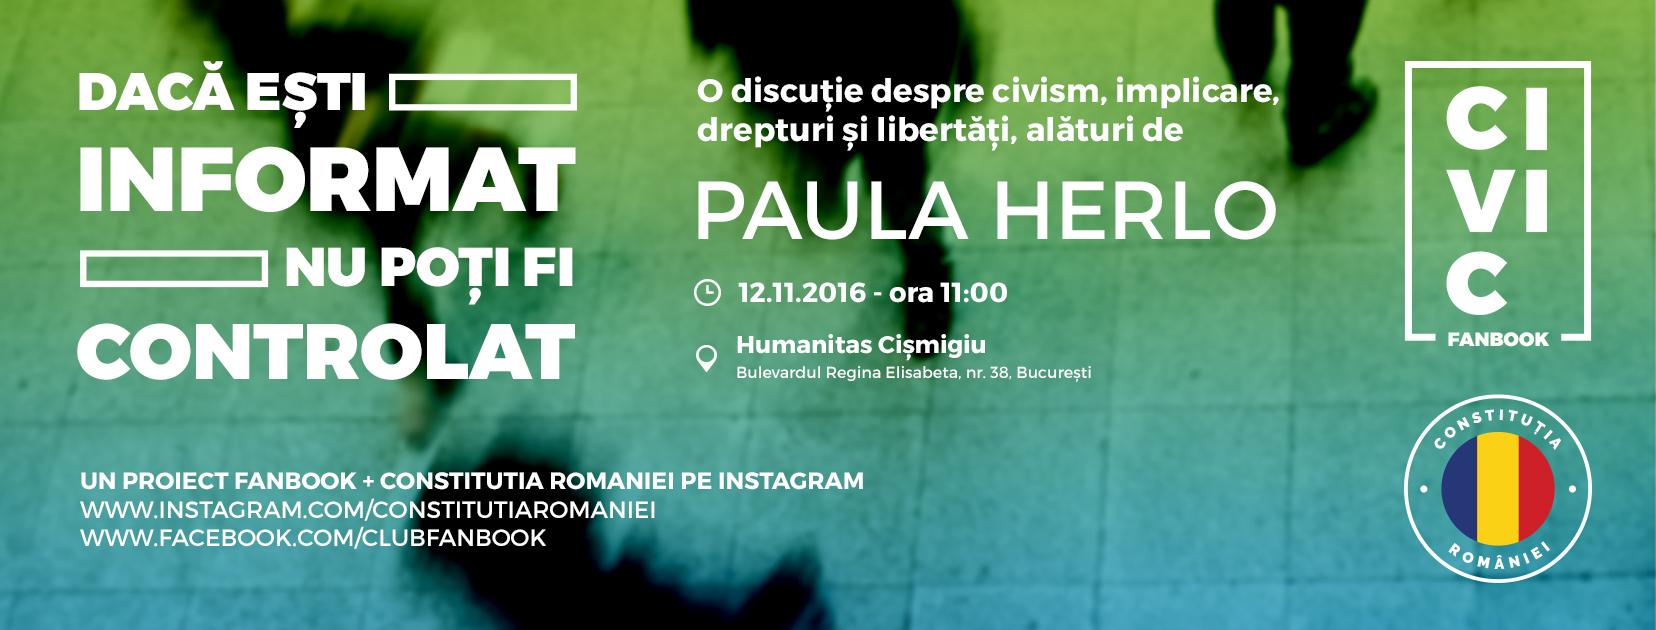 Civic Fanbook-12 noiembrie, Librăria Humanitas de la Cișmigiu